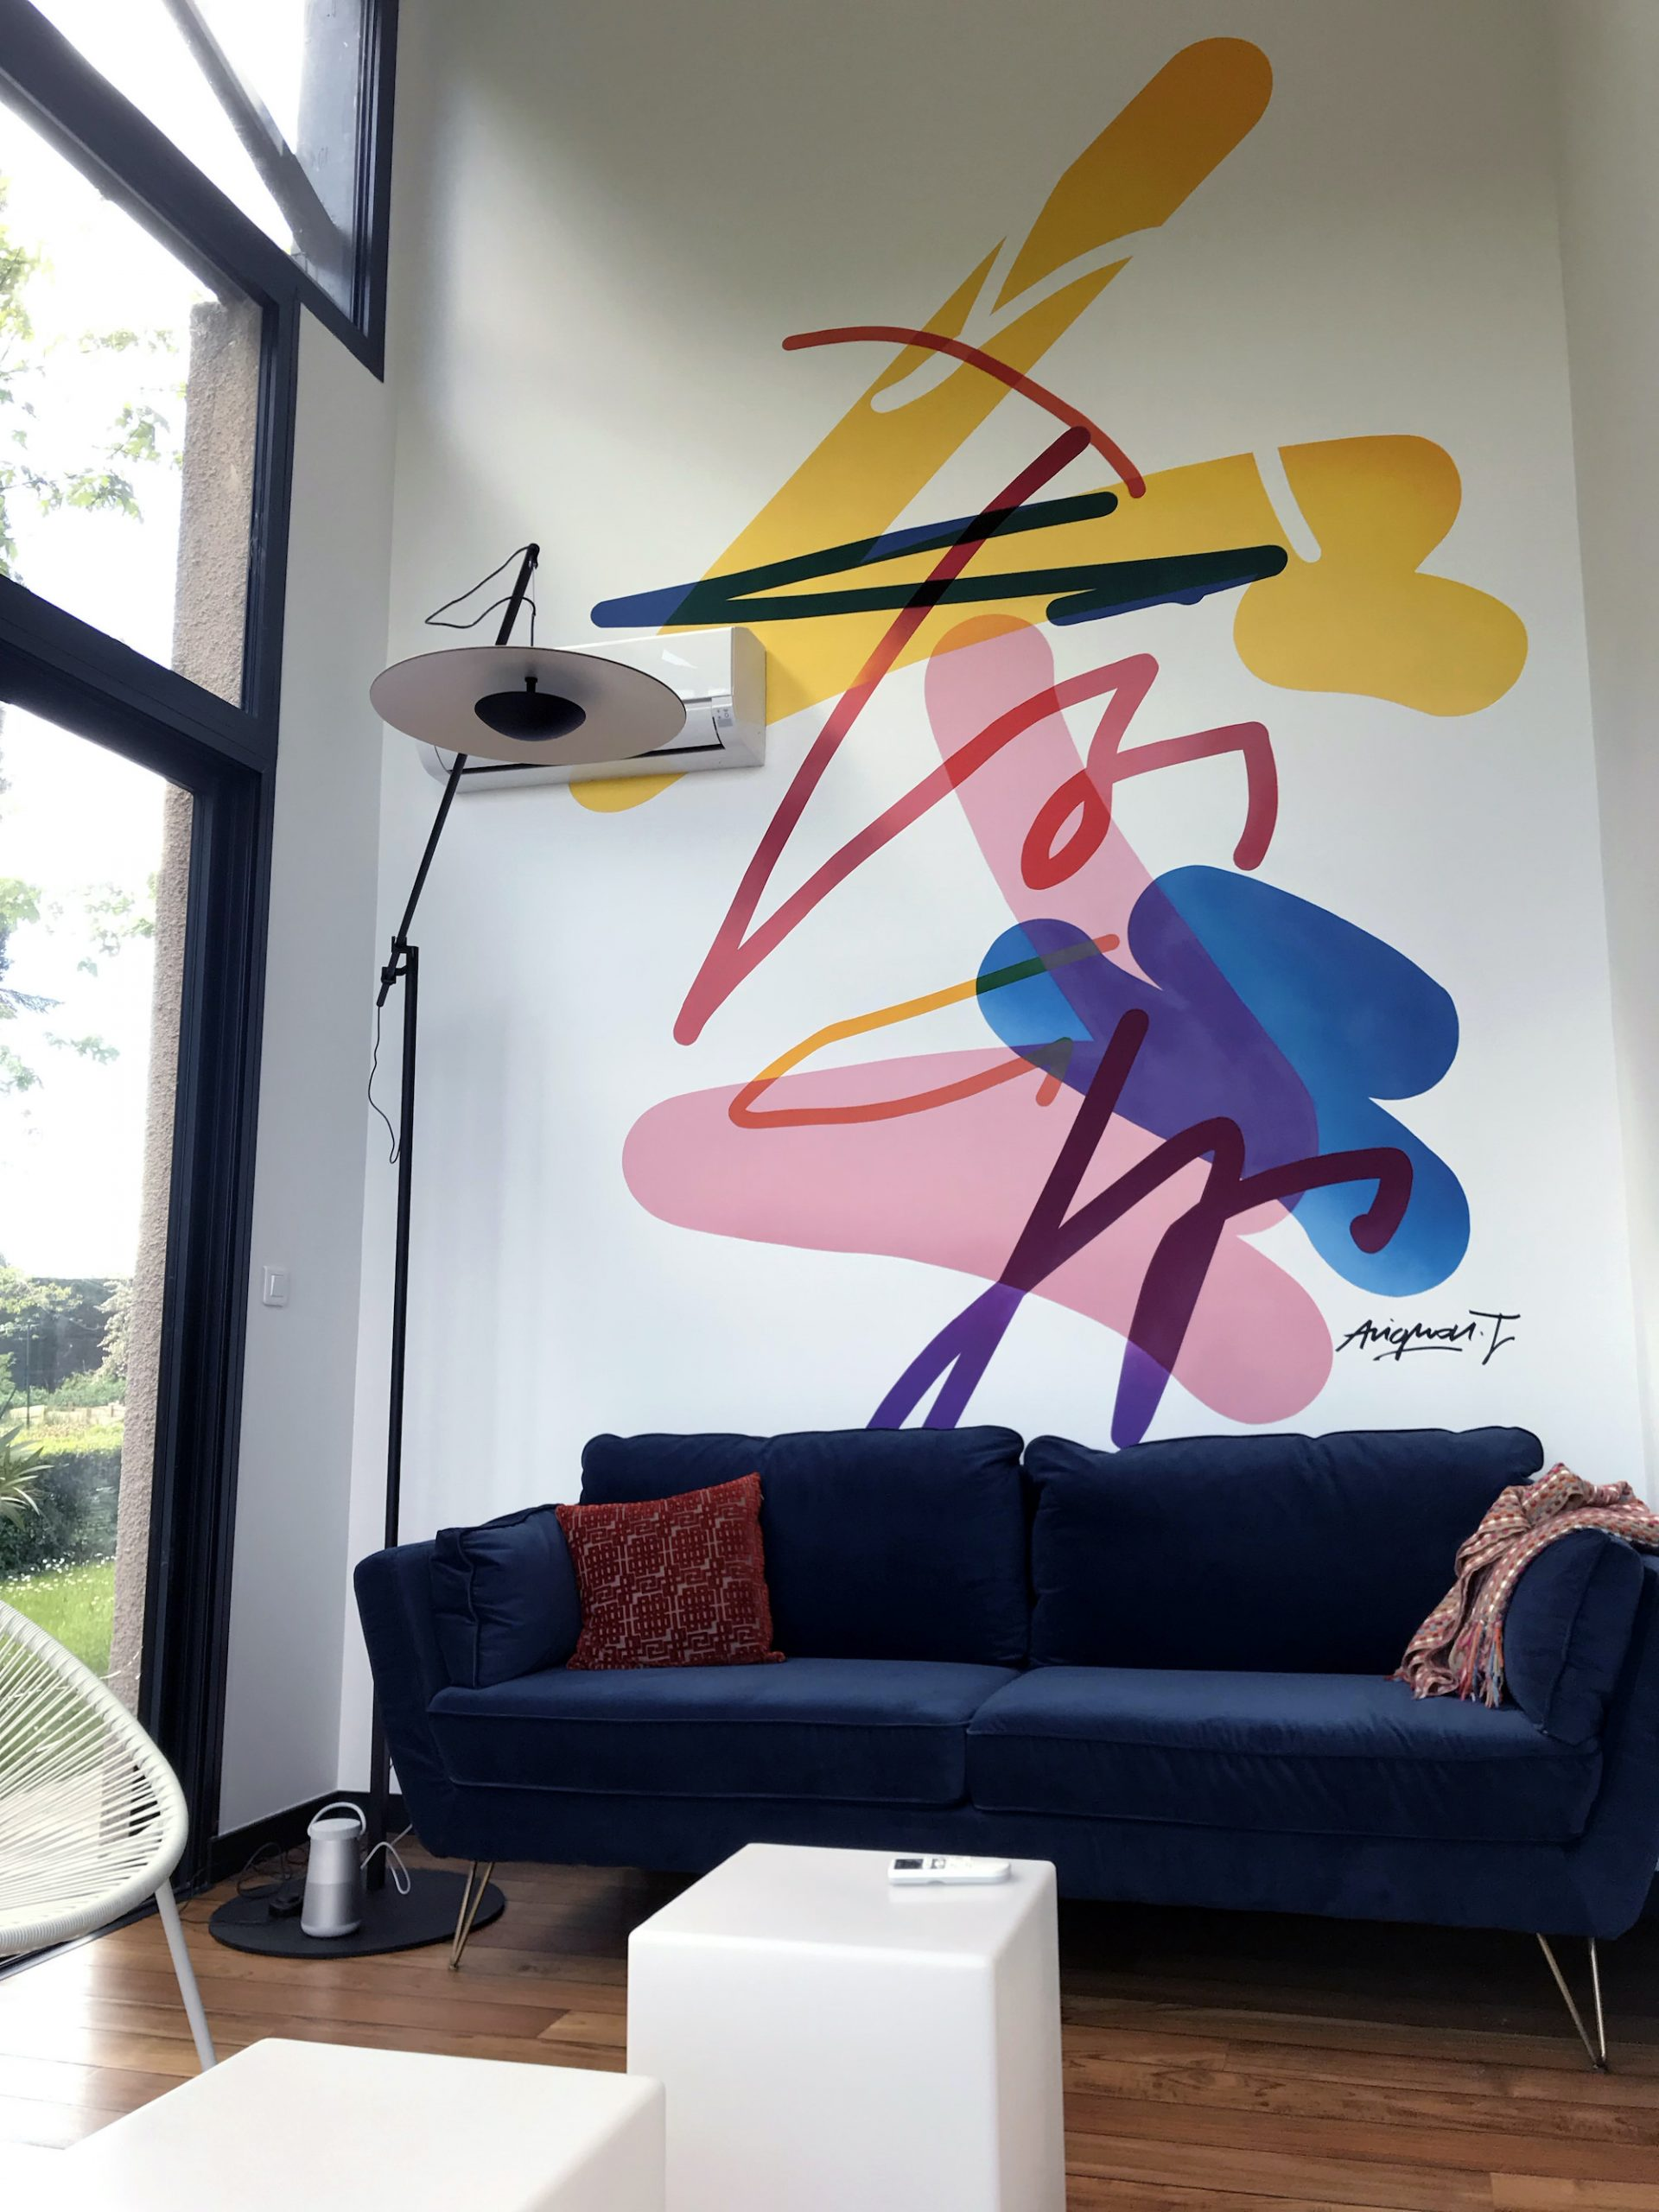 deco-interieur-graffiti-abstrait-streetart